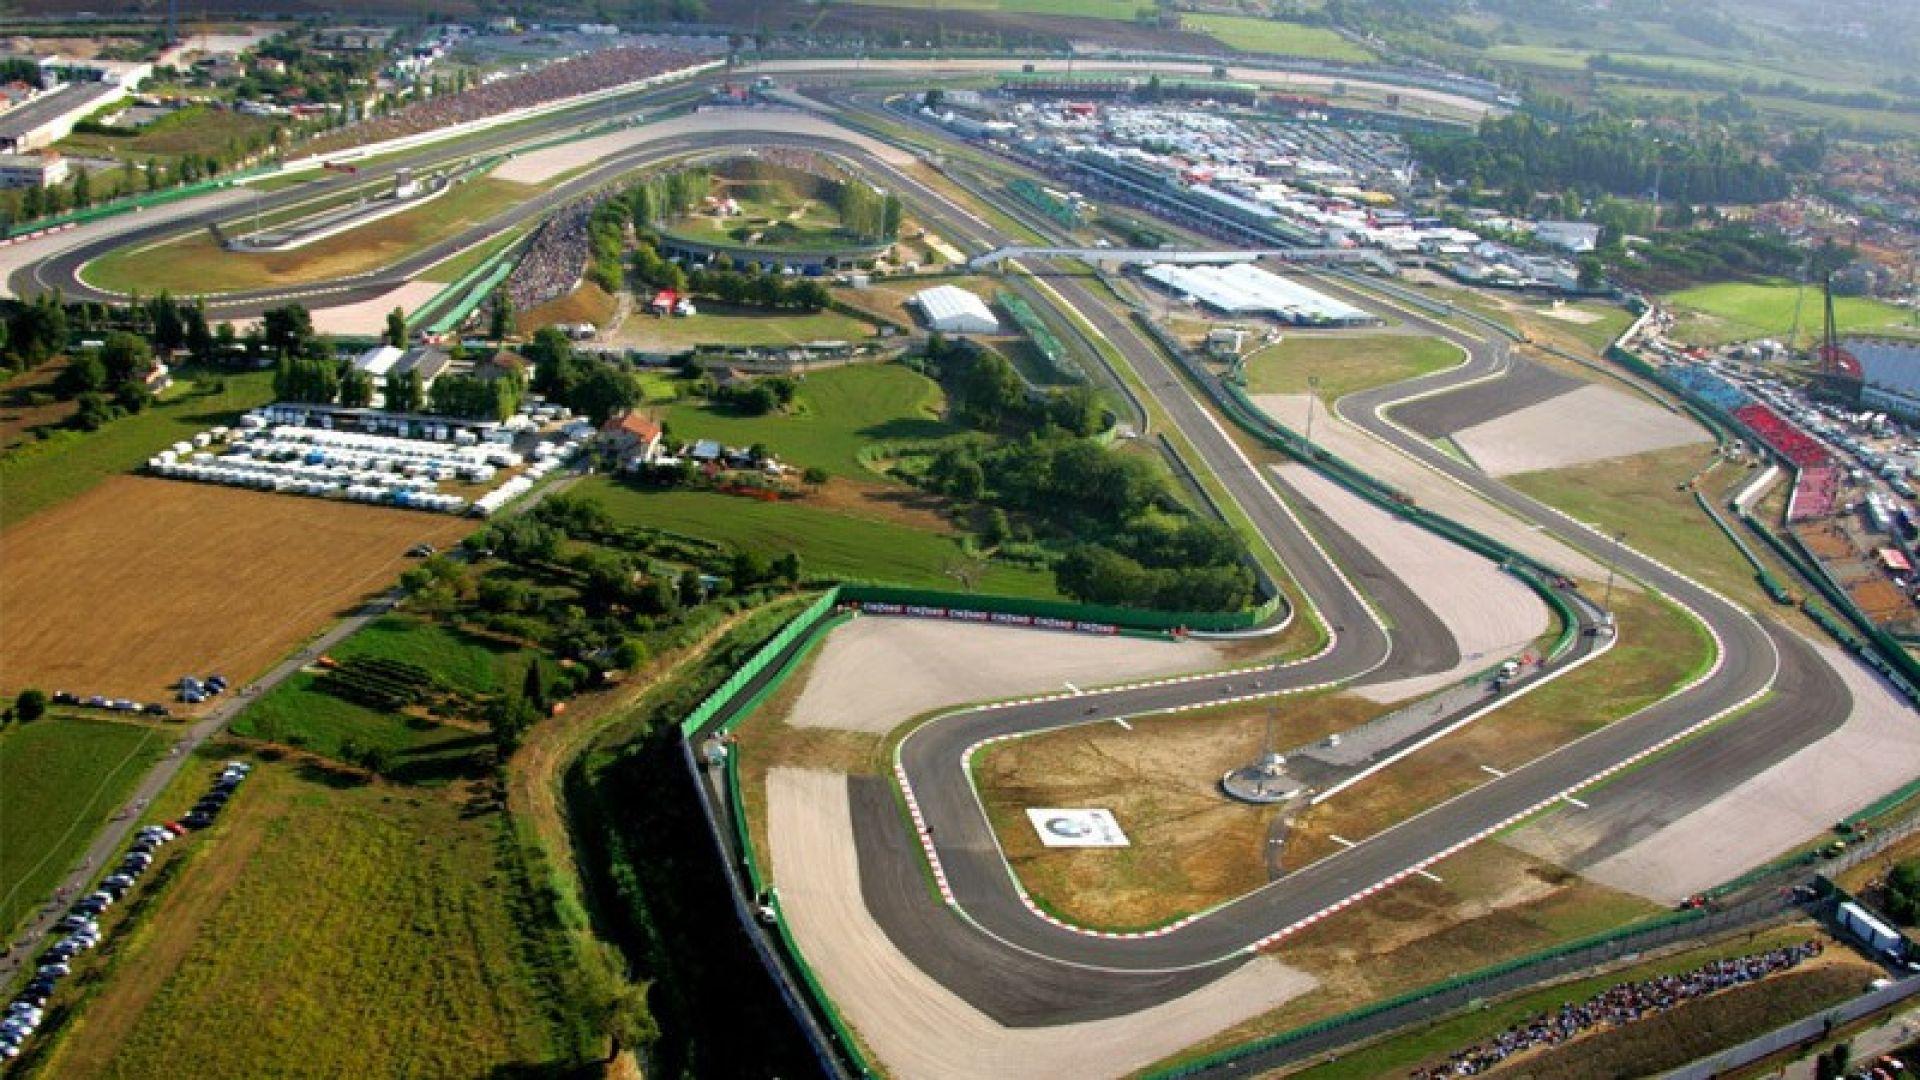 Circuito San Marino : Motogp gare motogp rimini e san marino prove libere